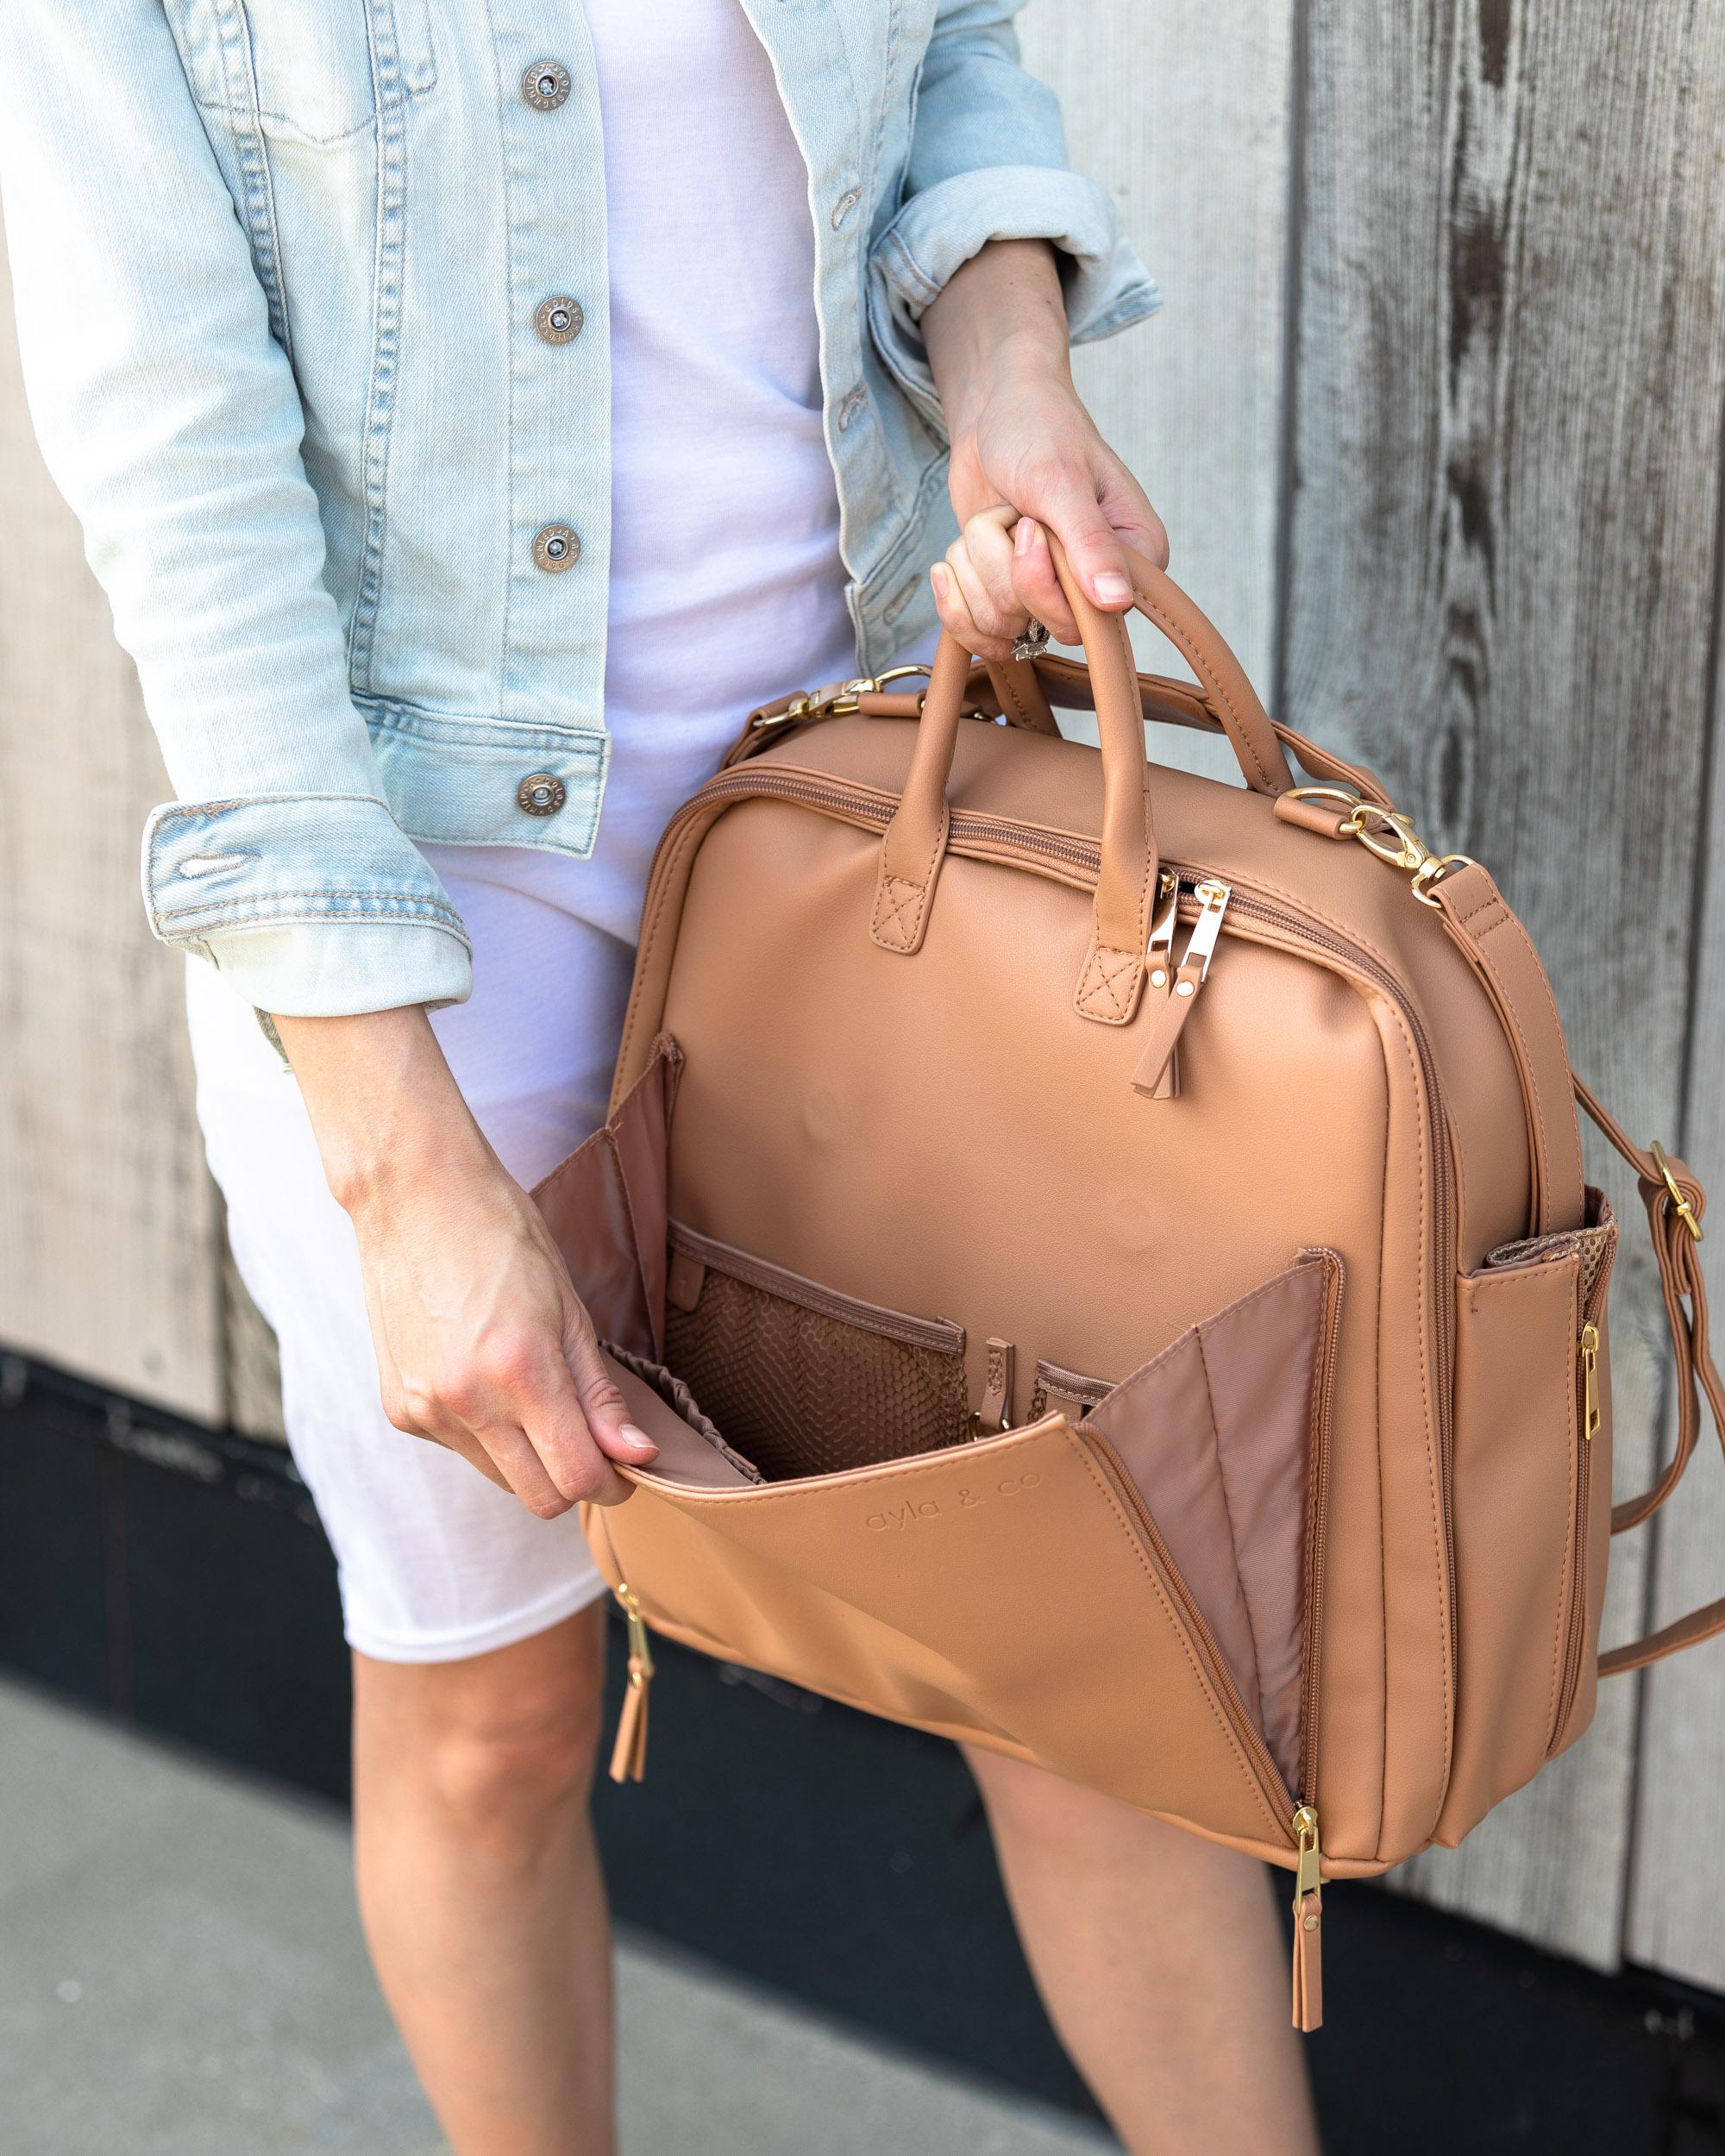 ayla-pockets-for-storage-the-glamorous-gal